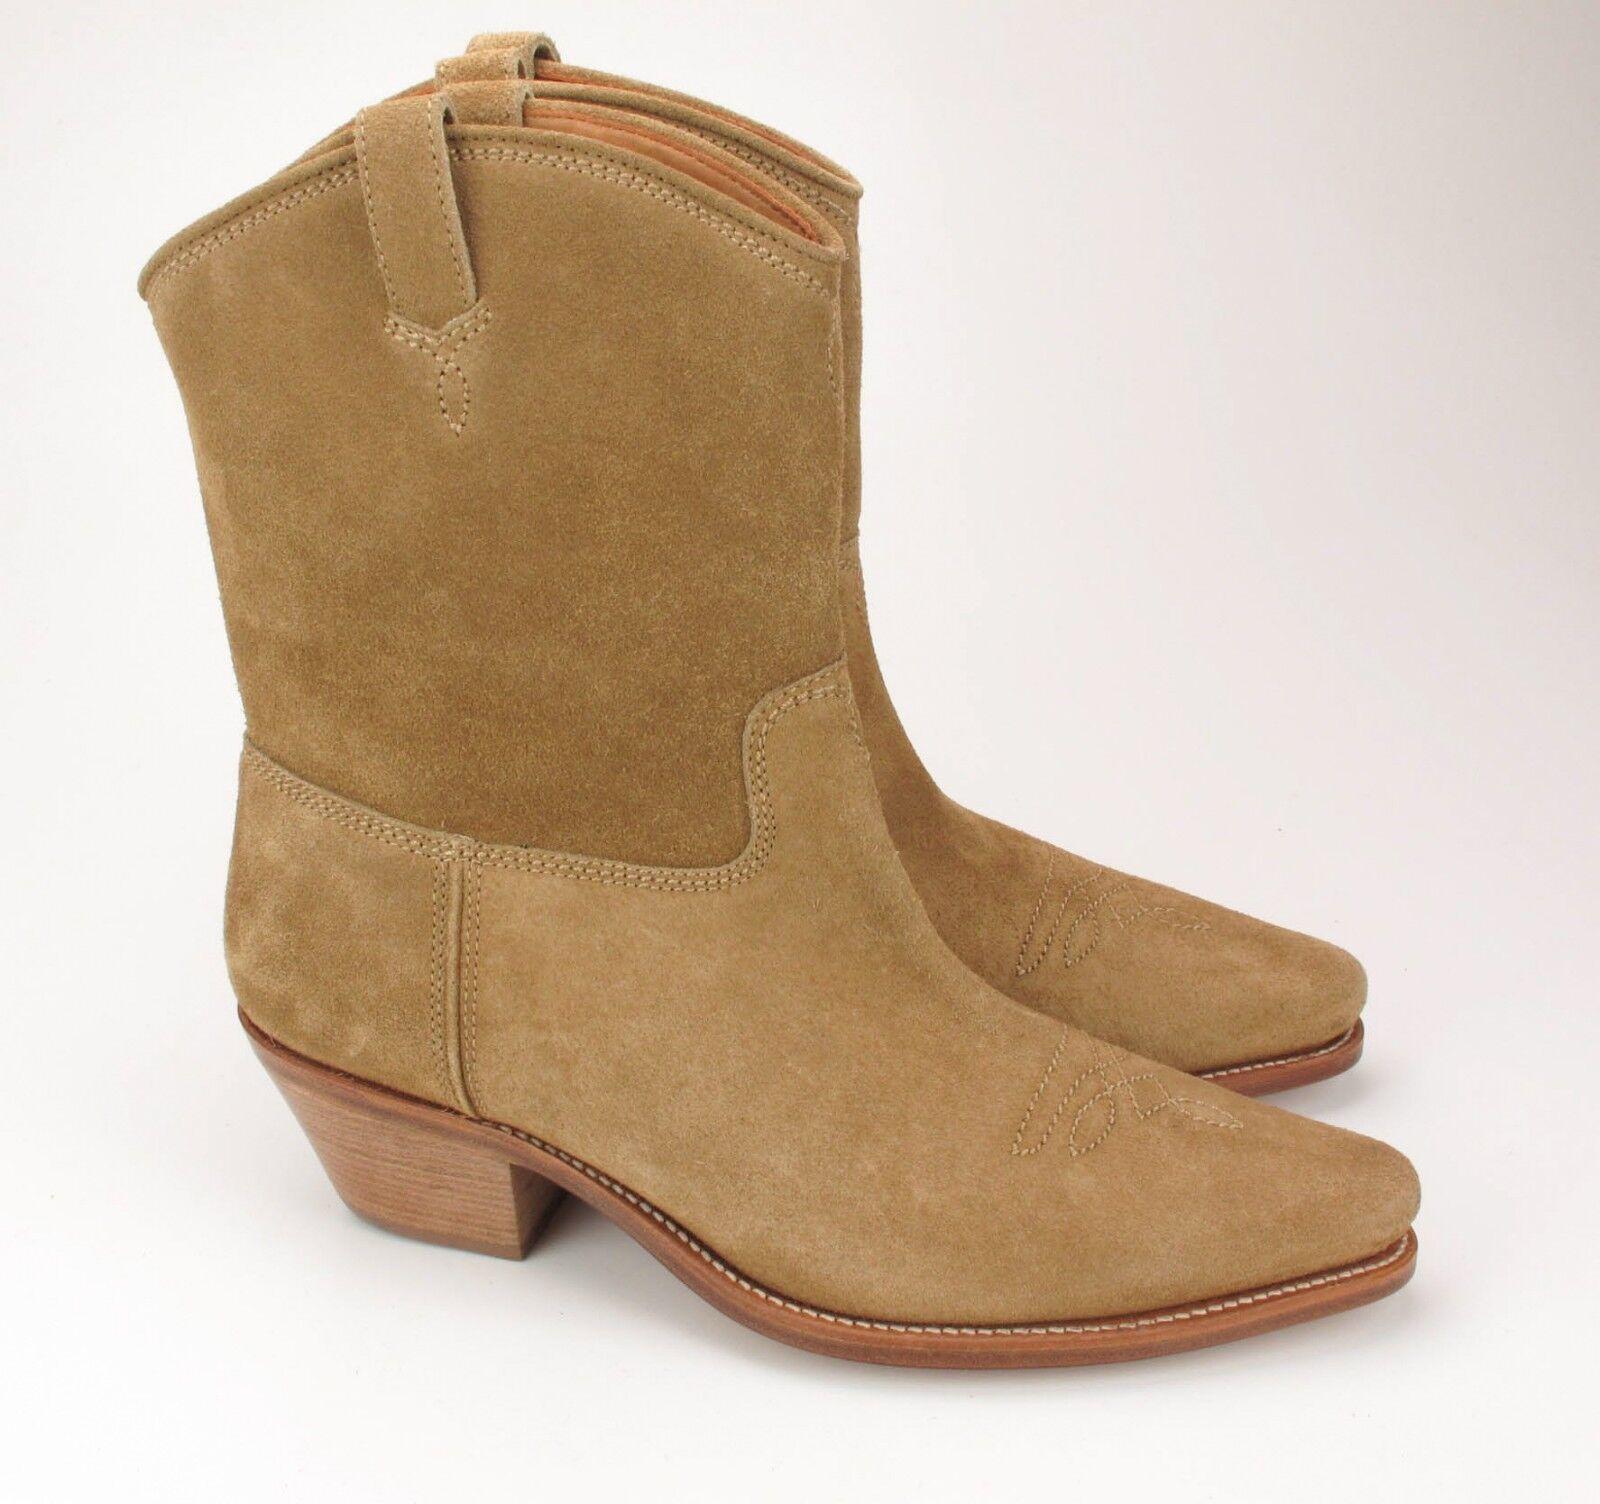 New Ralph Lauren Purple Label Olin Tan Suede Western Style Boots 10.5 D